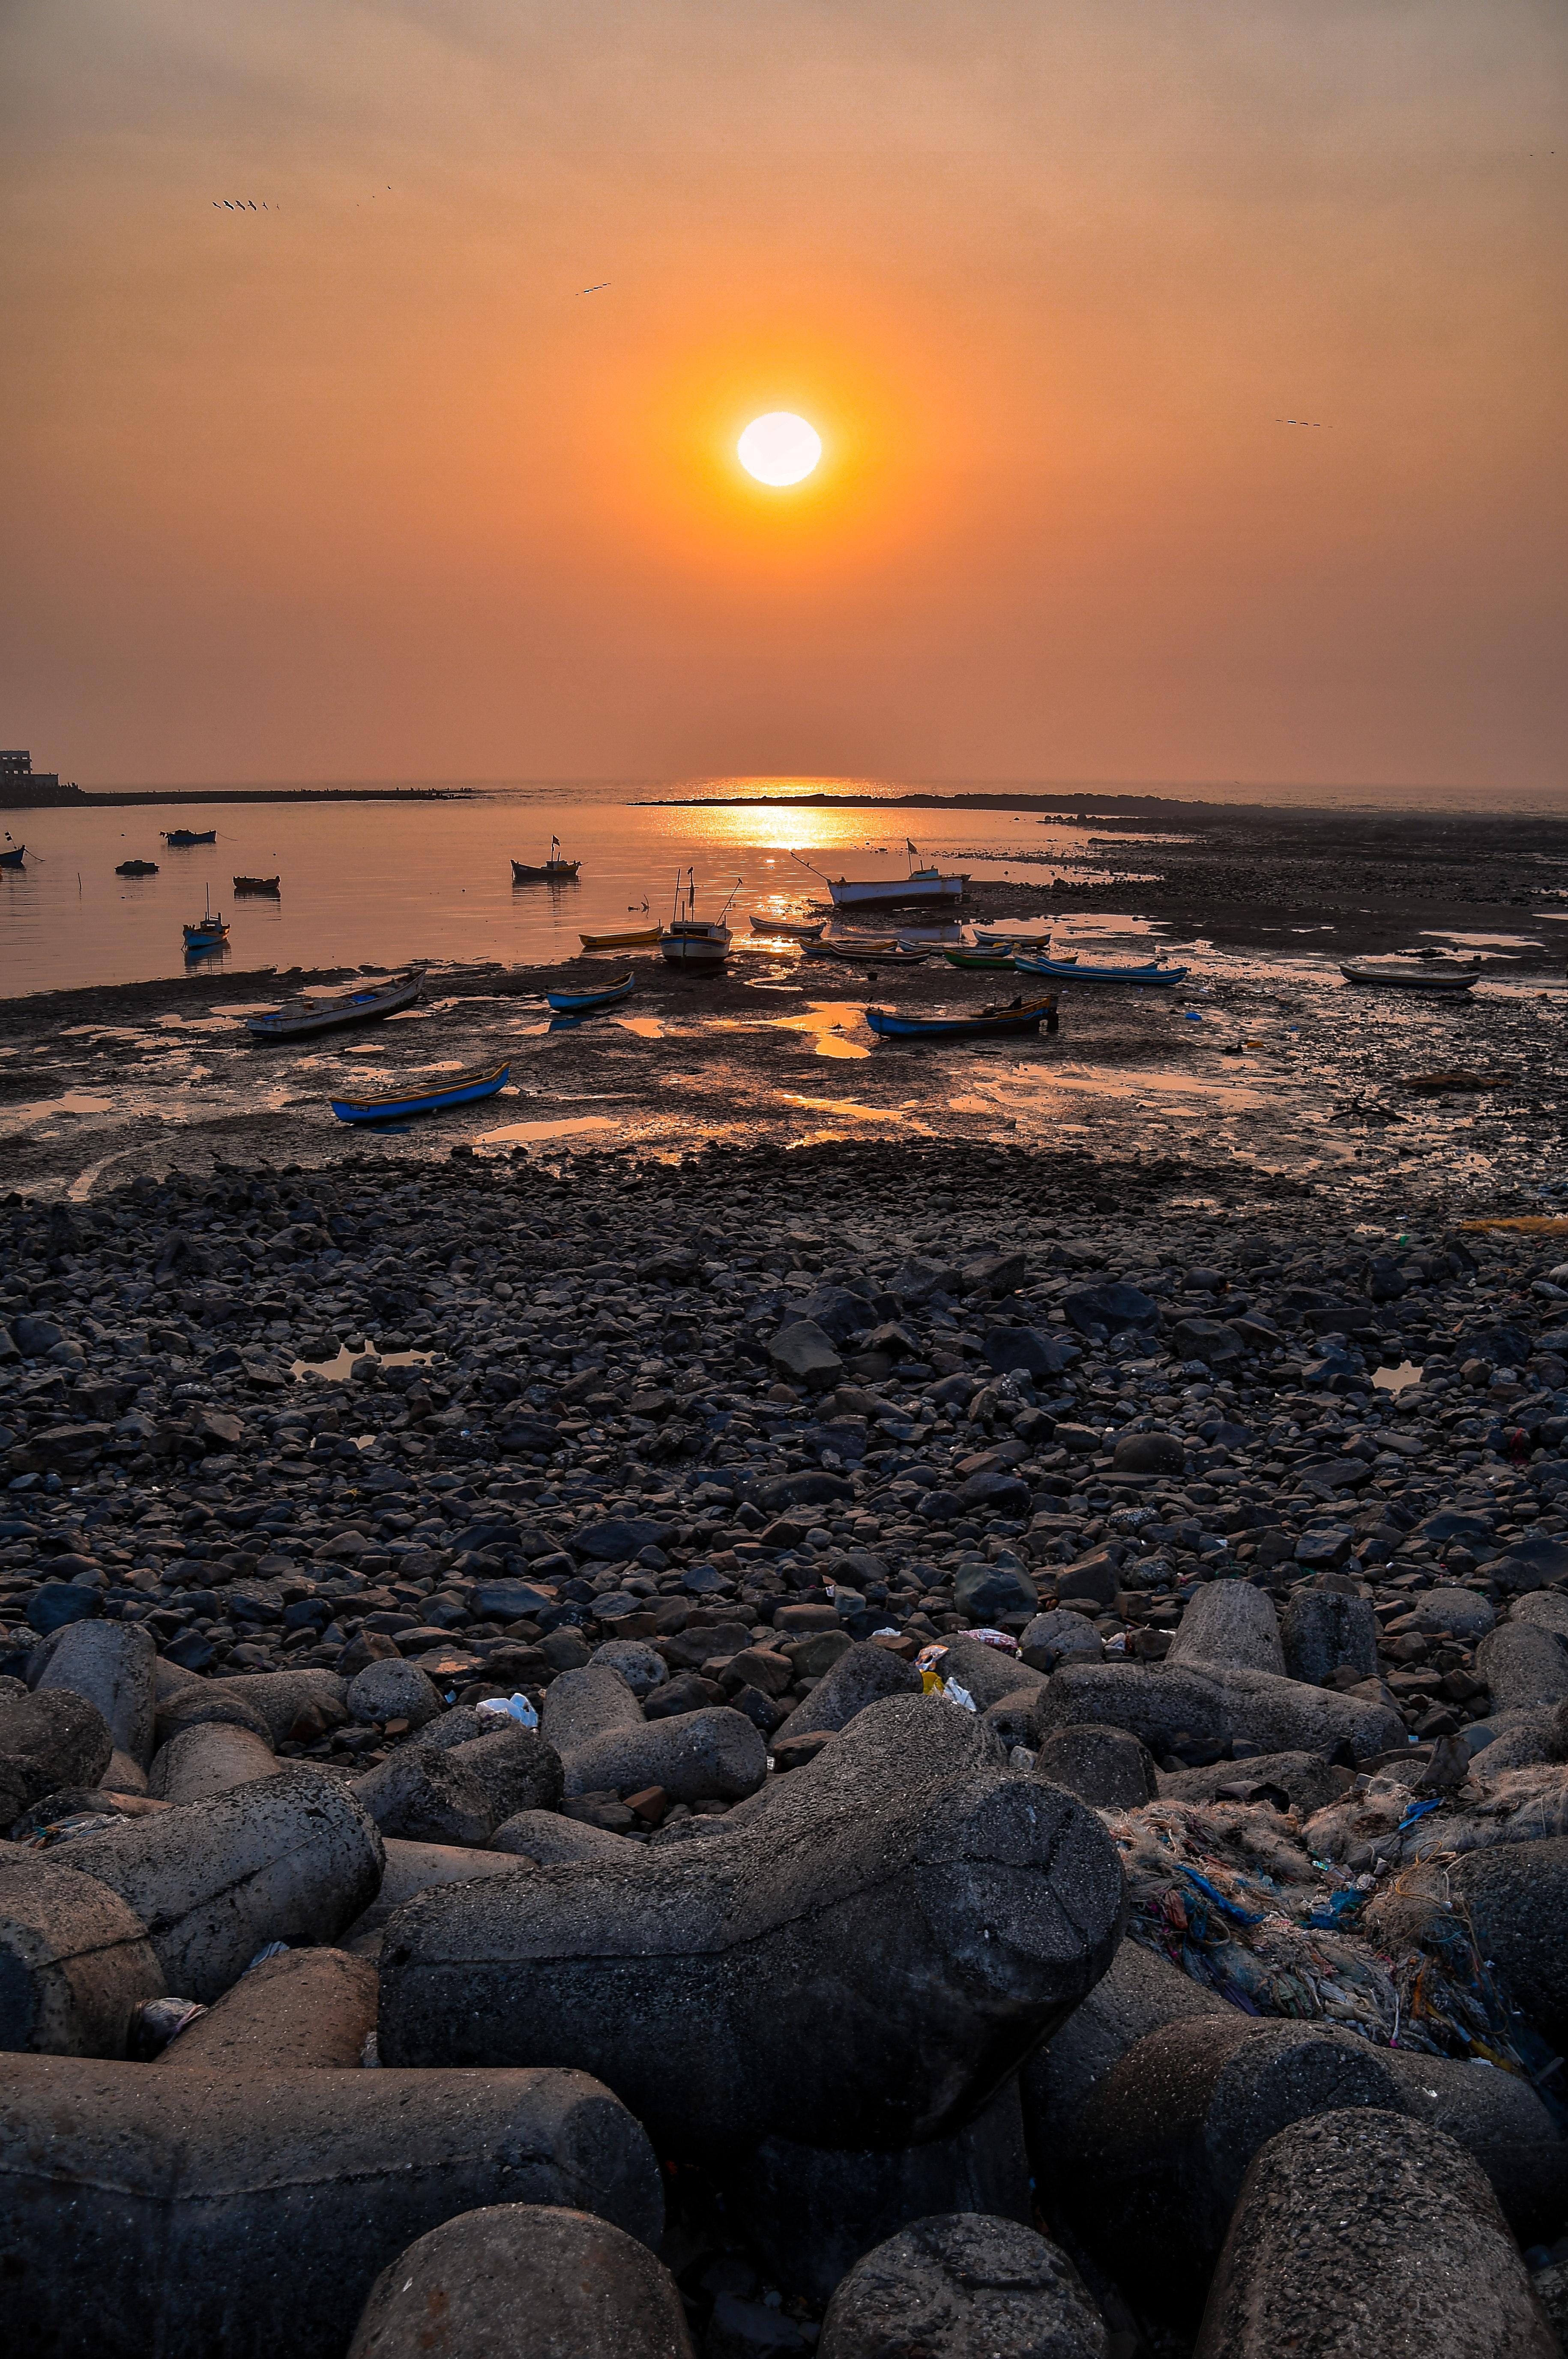 Golden Hour Photo of Seashore, Background, Seashore, Sand, Scene, HQ Photo